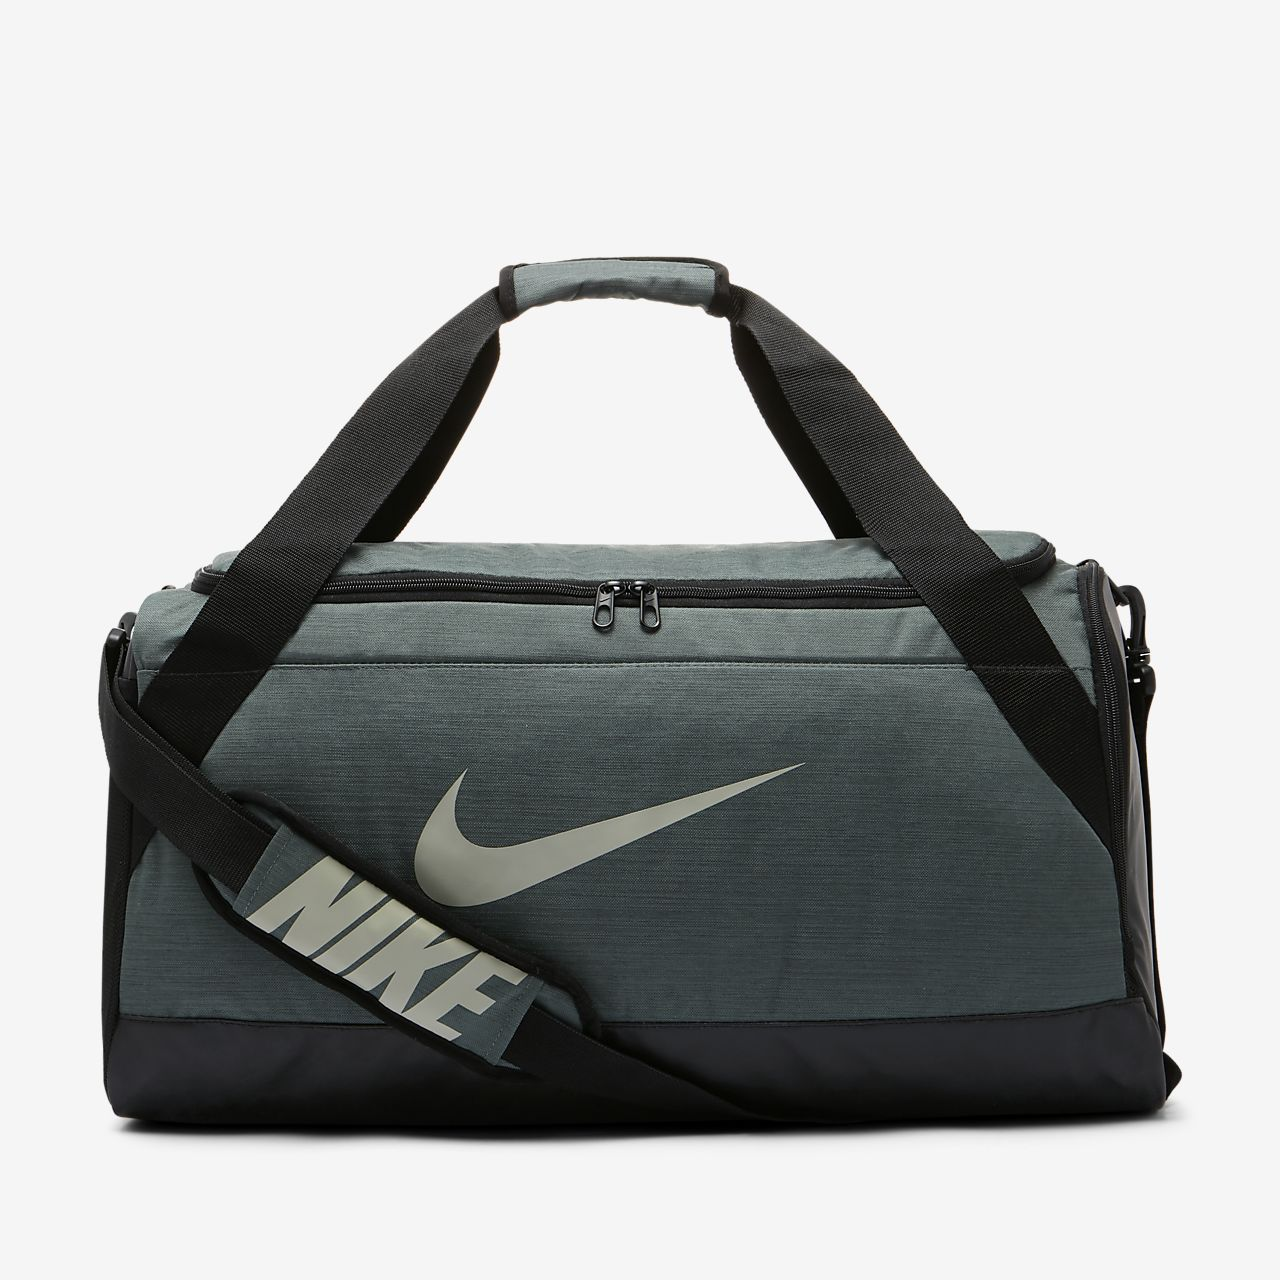 Nike Bolsa De Deporte Brasilia Entrenamientomediana Sportswear OZiXuPk